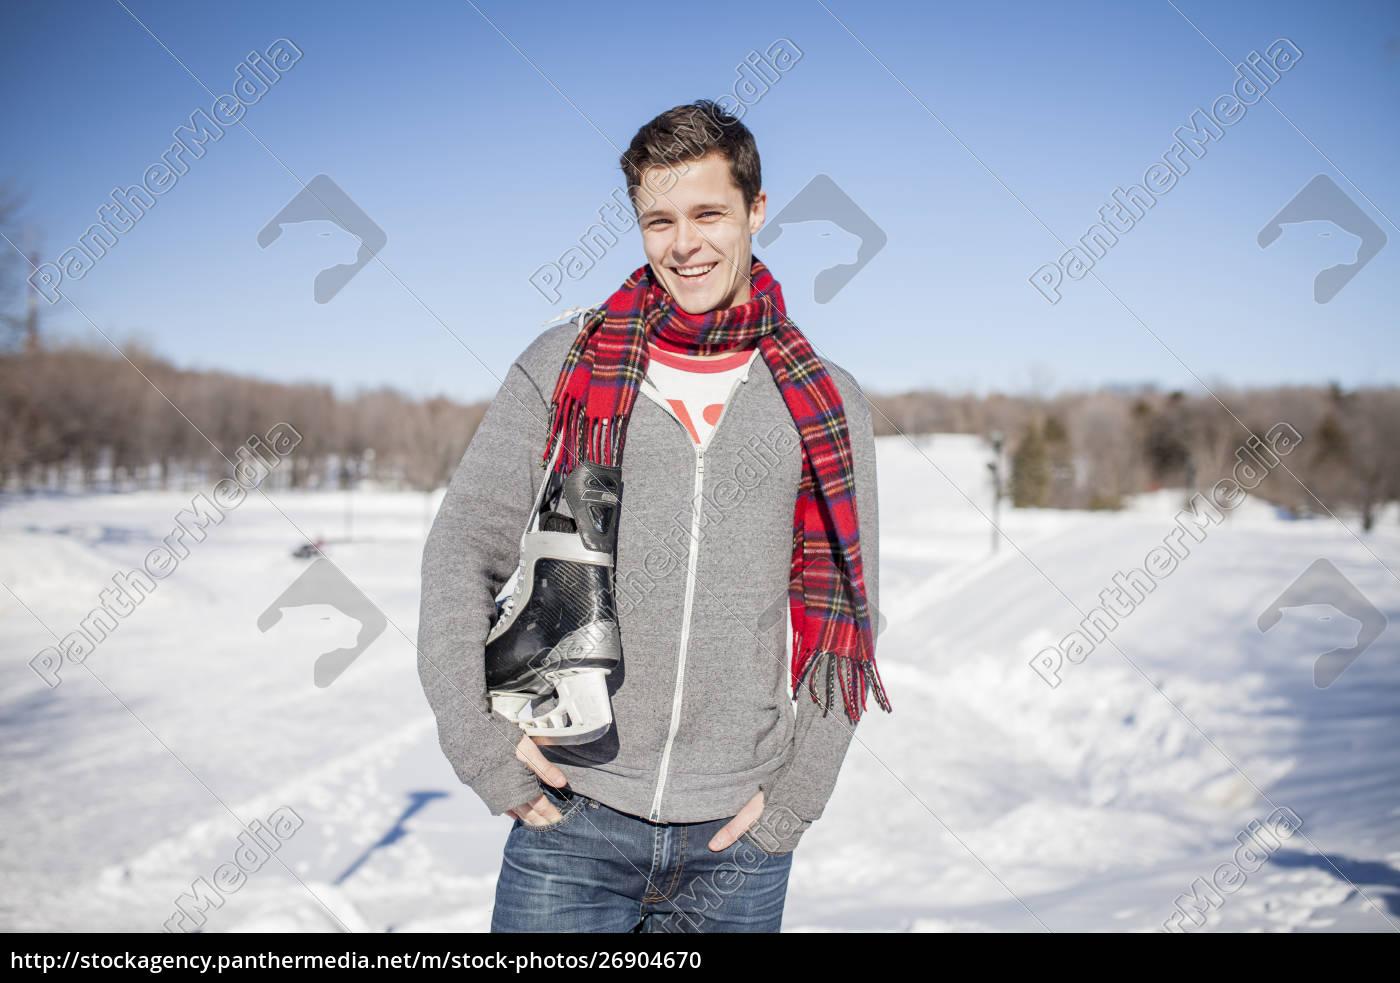 caucasian, man, carrying, ice, skates, in - 26904670